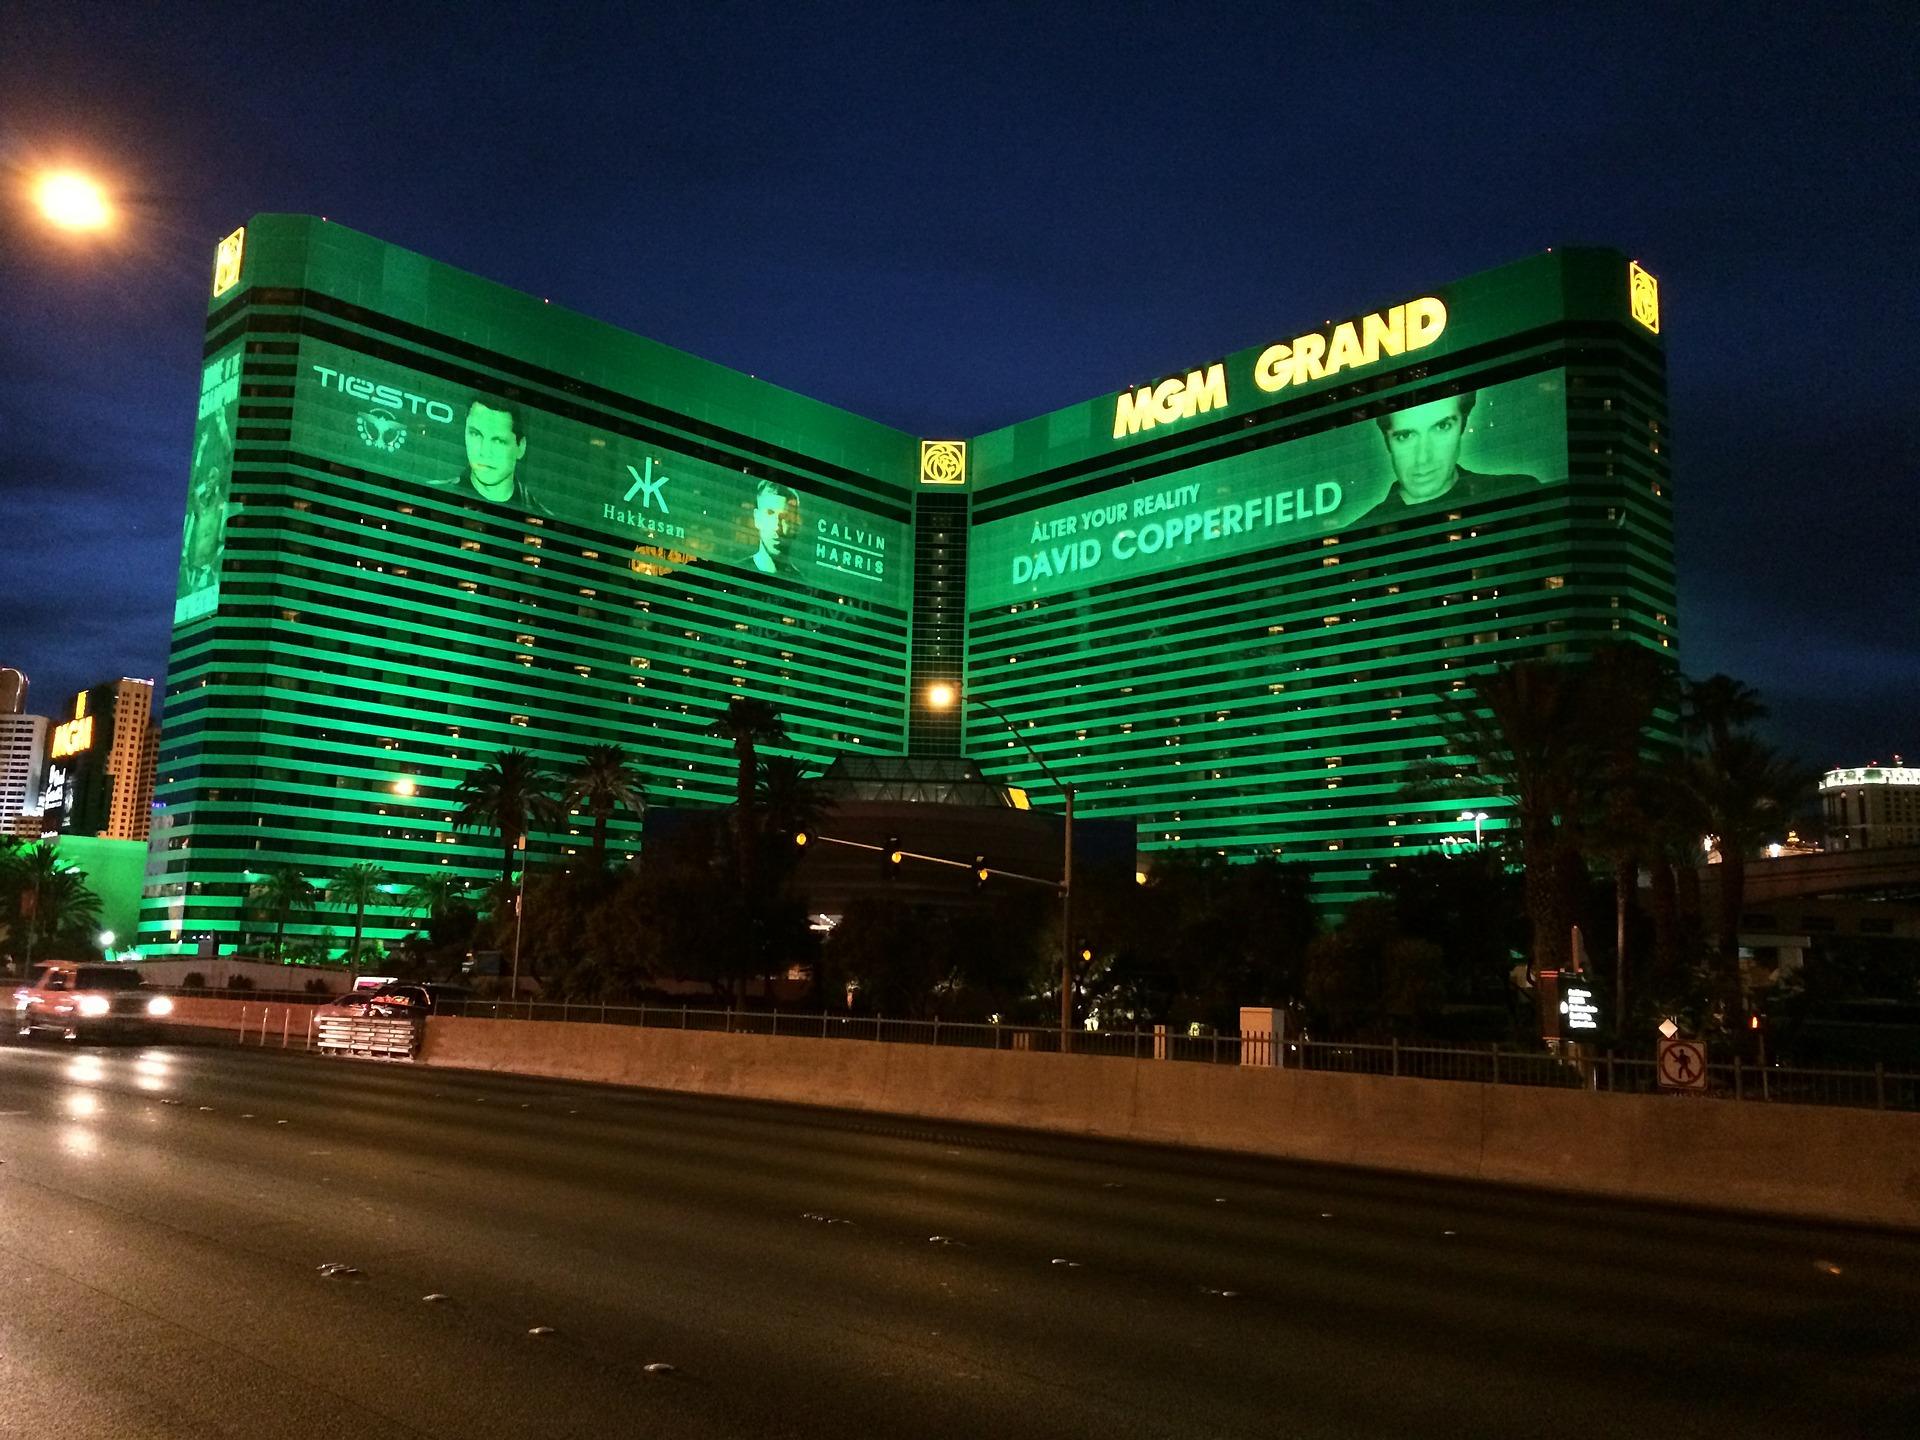 The History Of The Mgm Grand And Mgm Signature Las Vegas Condos Las Vegas High Rise Condo Living Savi Realty